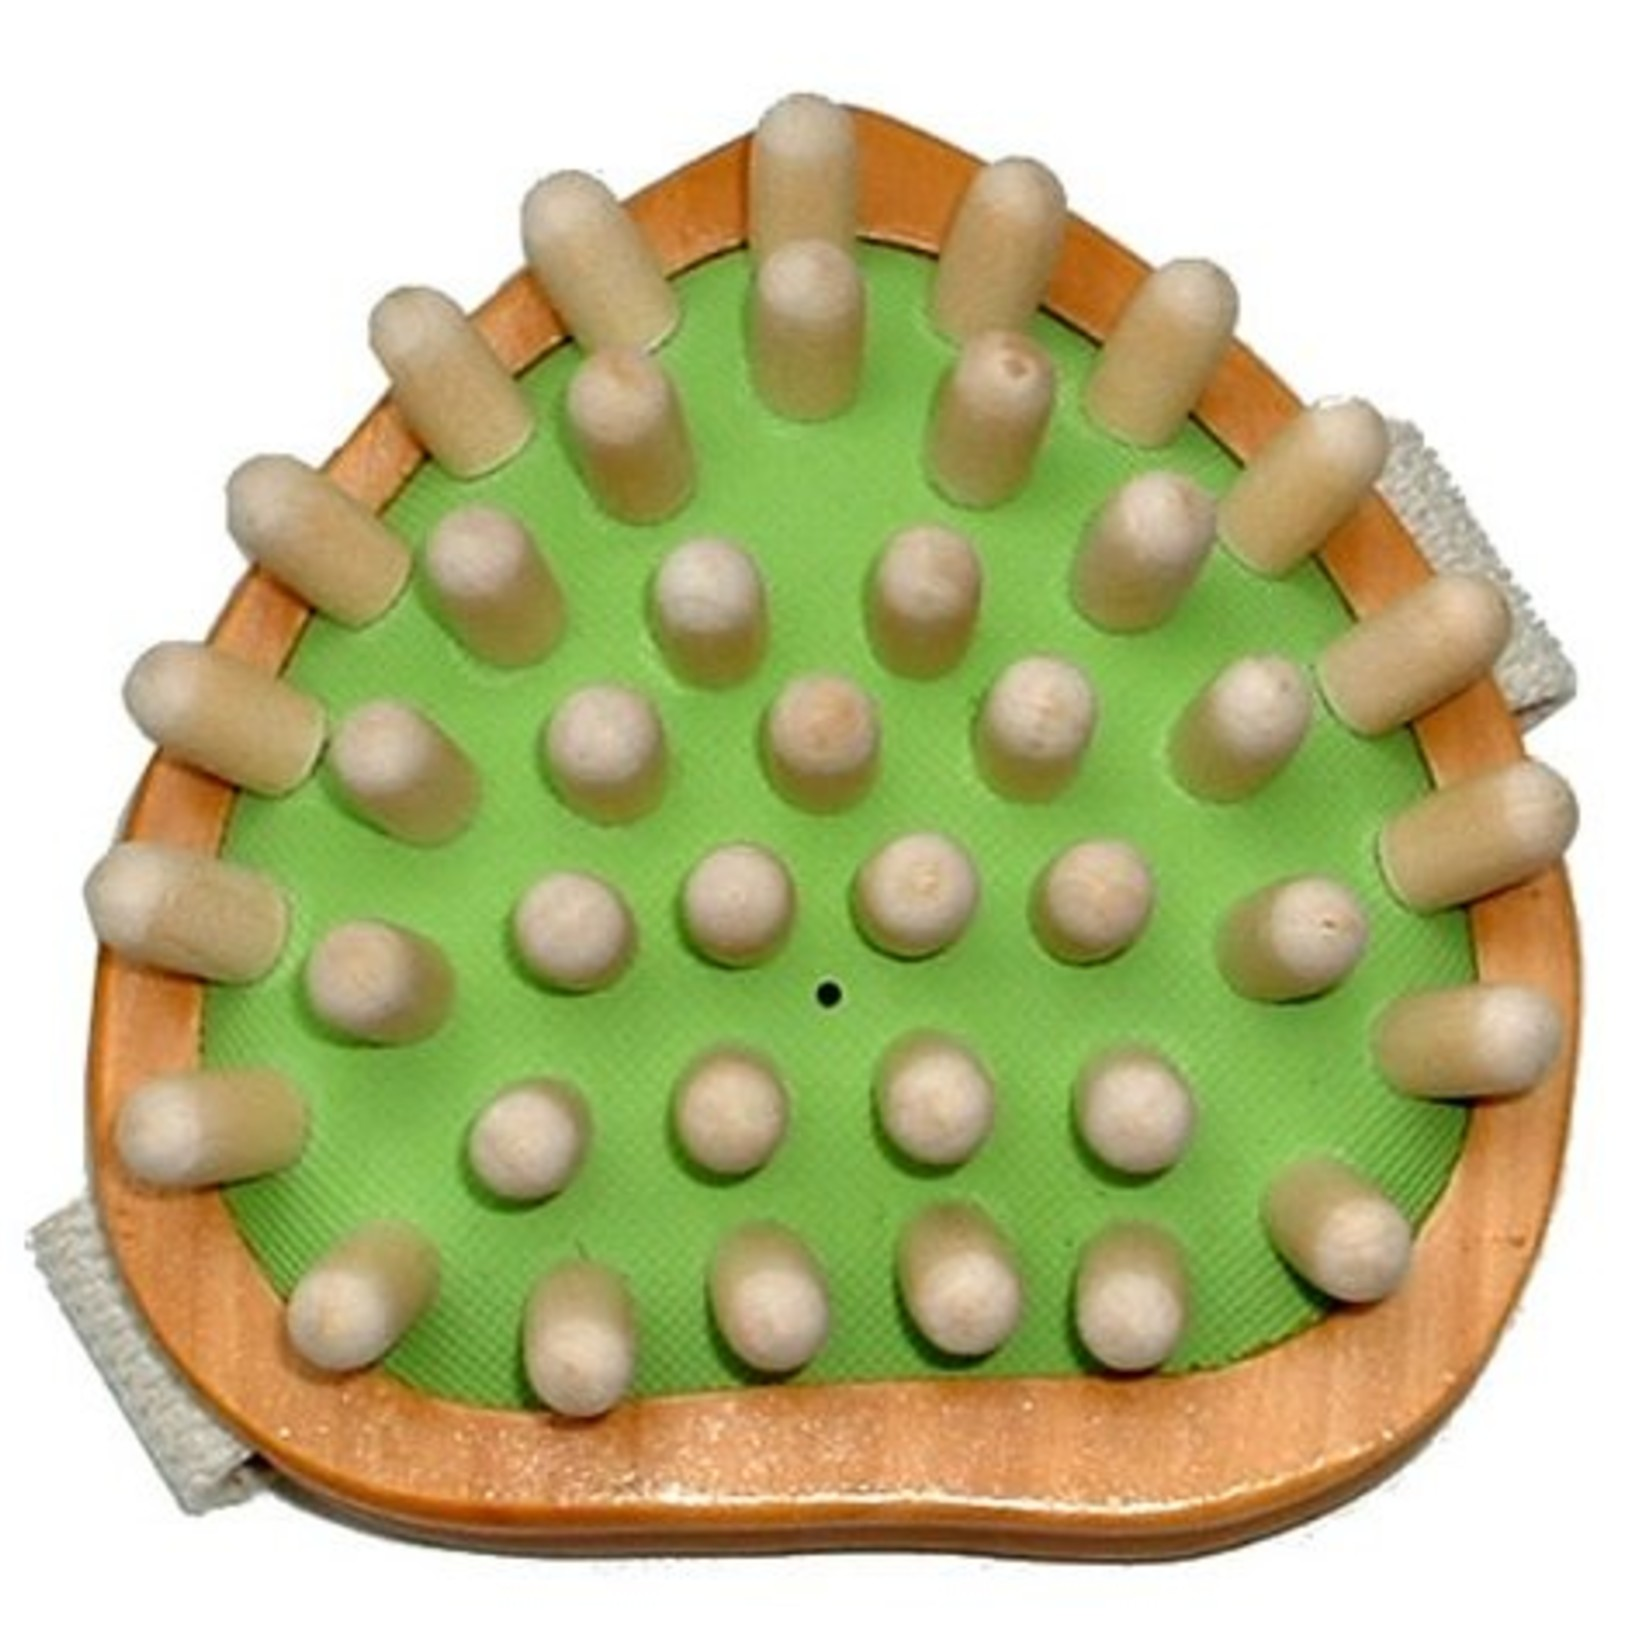 Kost Kamm Esdoornhouten massageborstel bij o.a. cellulitis